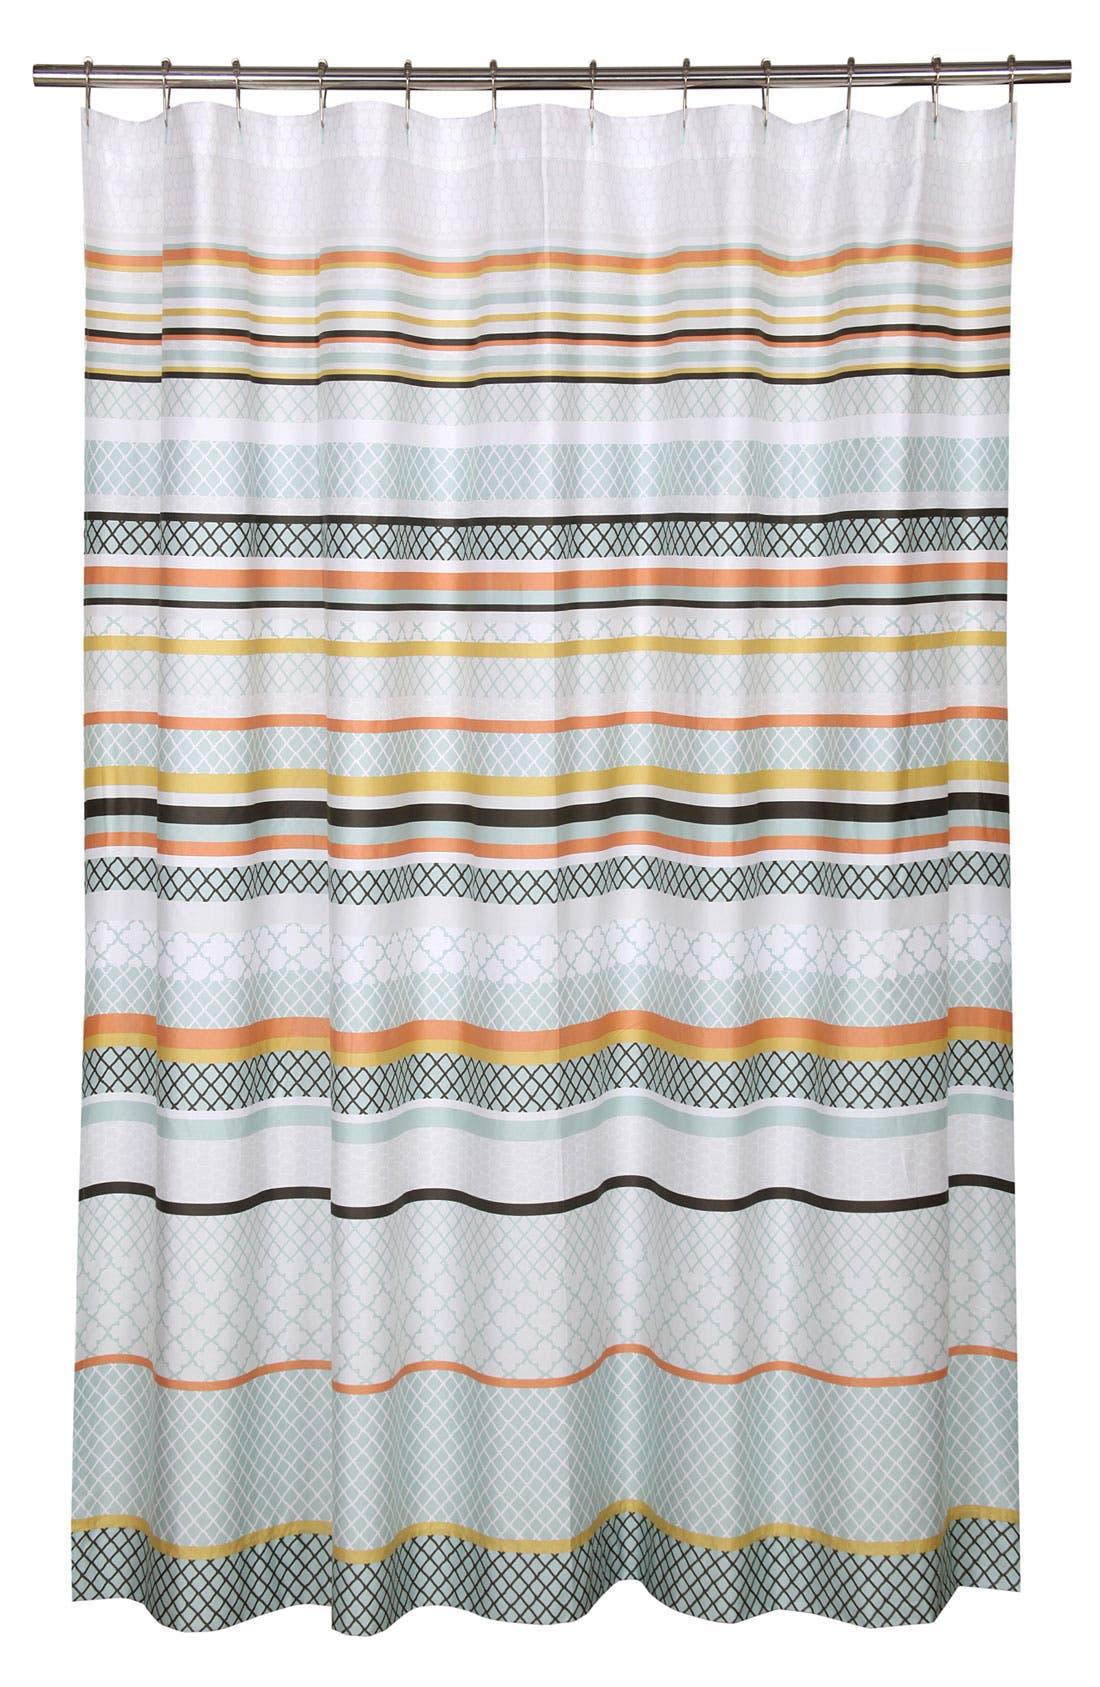 Alternate Image 1 Selected - Blissliving Home 'Recoleta' Shower Curtain